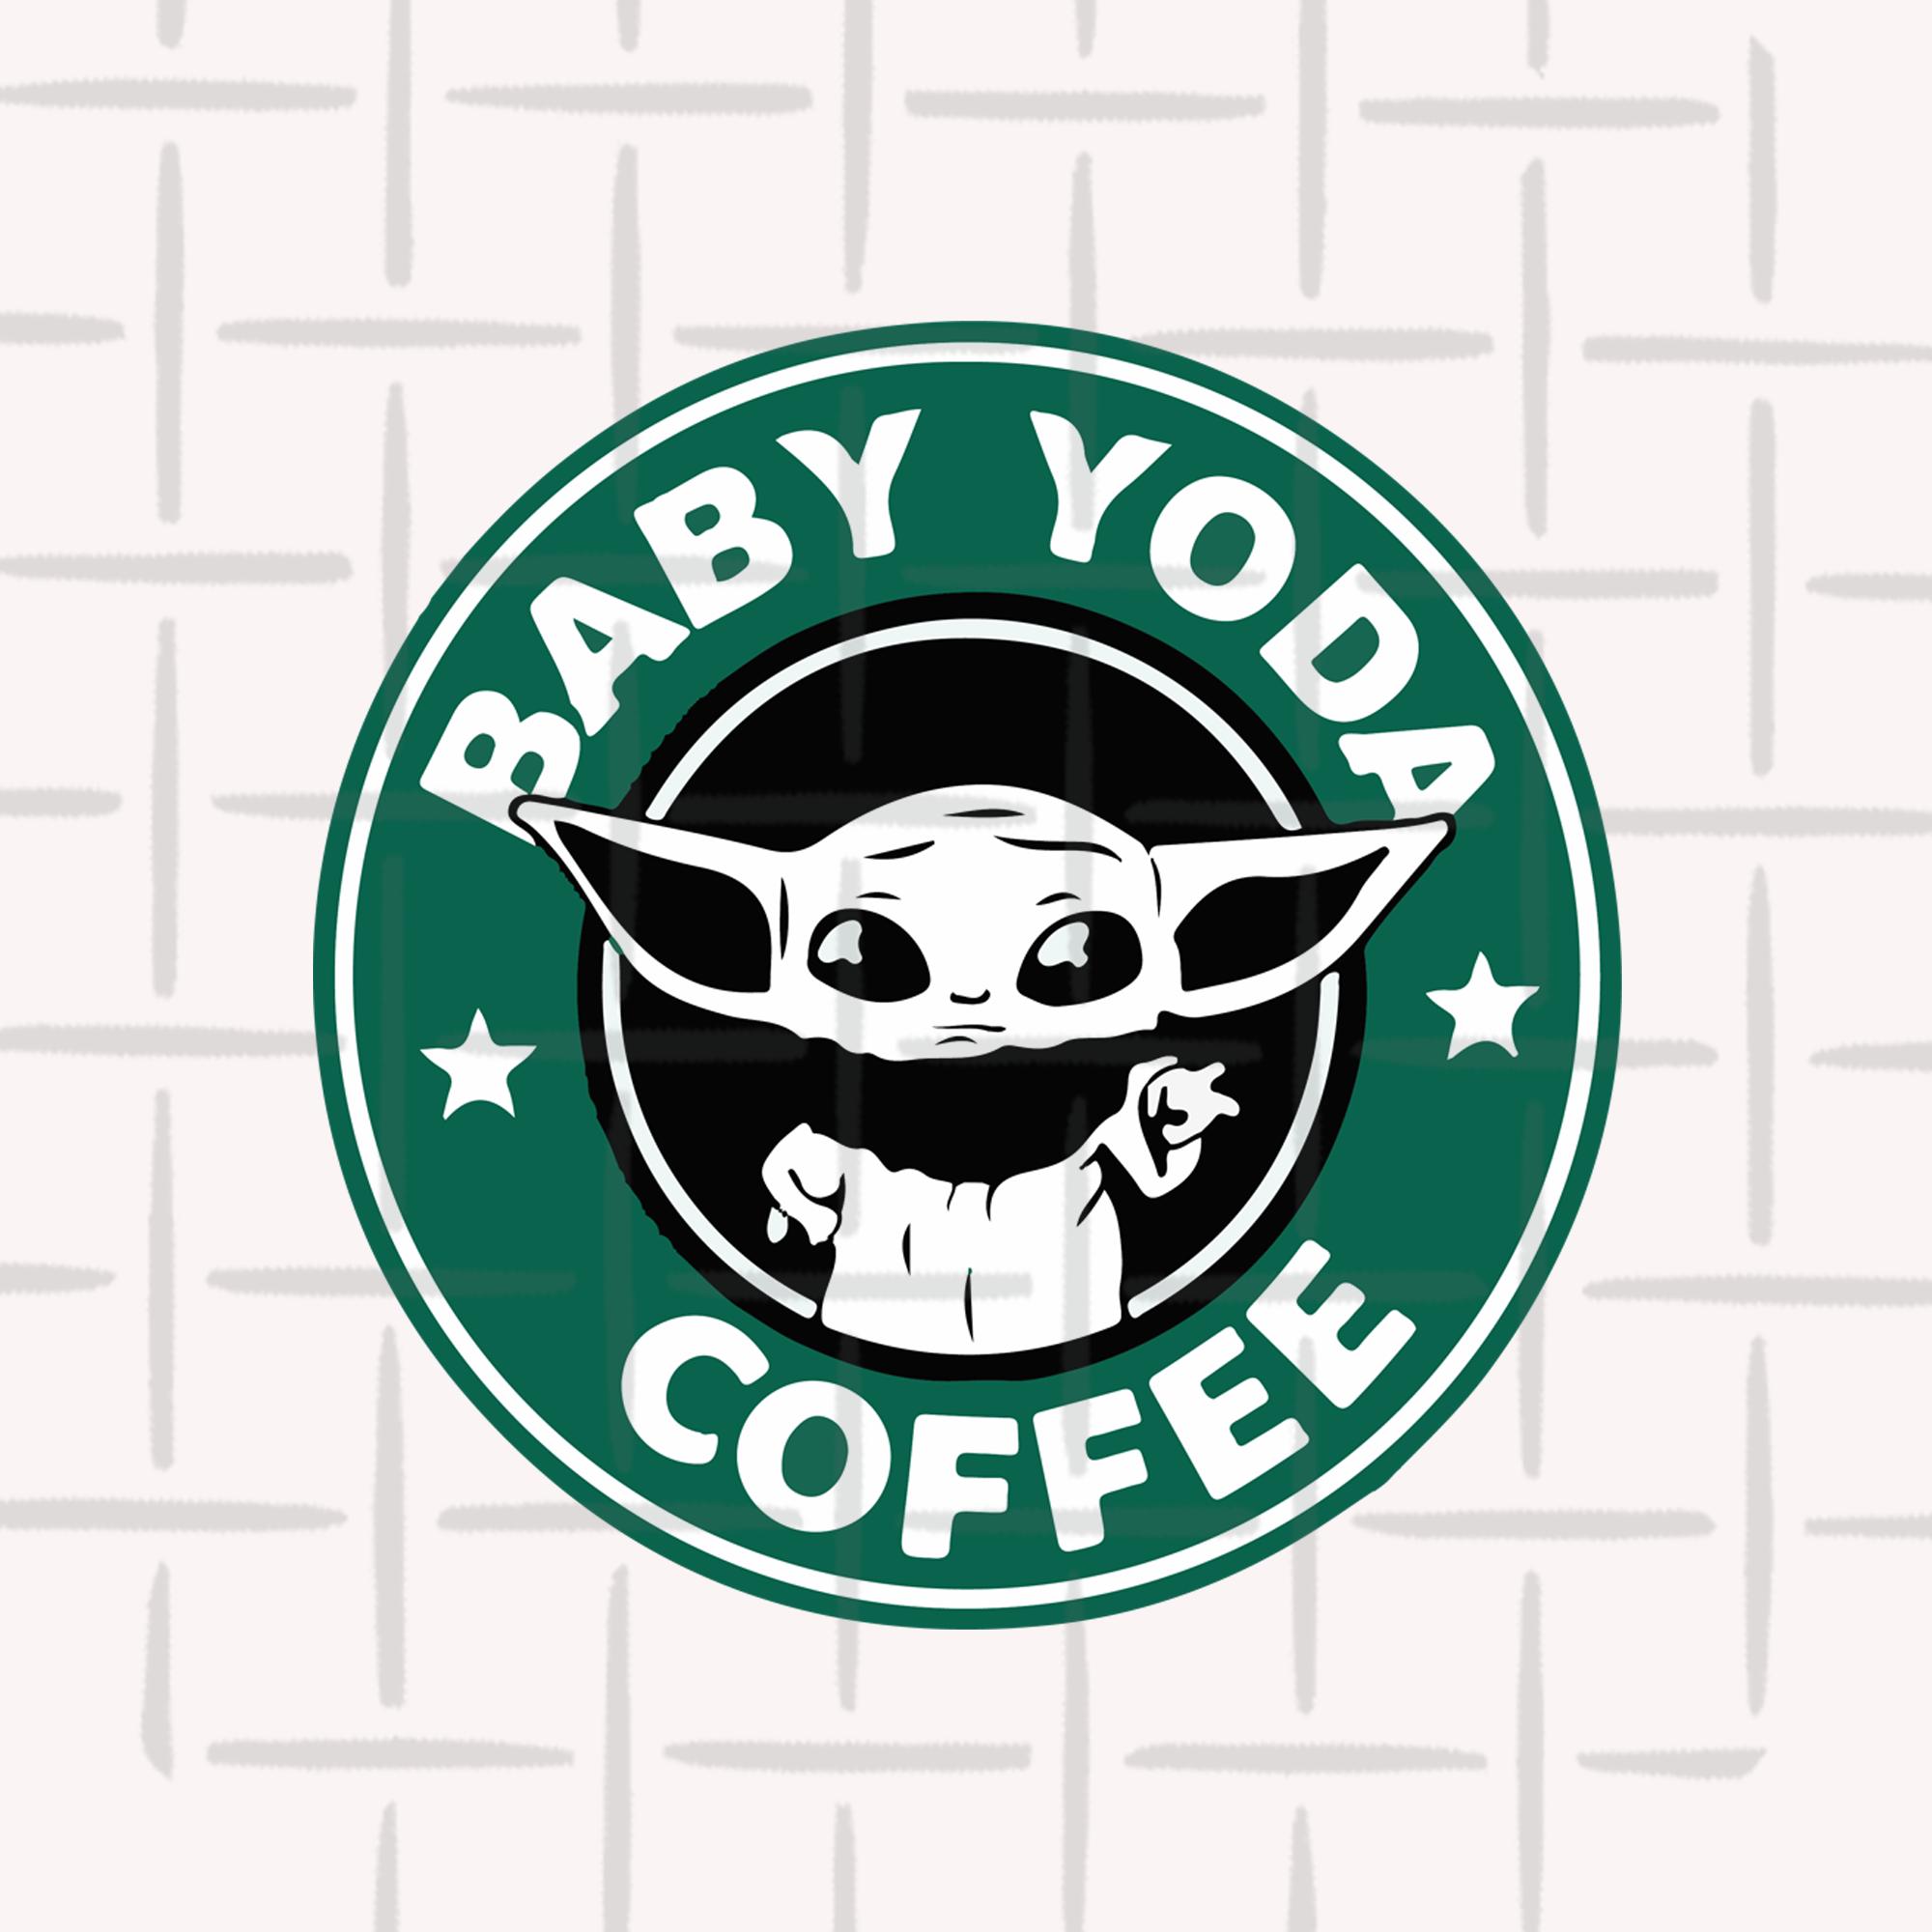 Baby Yoda Svg The Child Svg Mandalorian Baby Yoda Svg Star Wars Svg Star Wars Nerd Yoda Yoda Meme